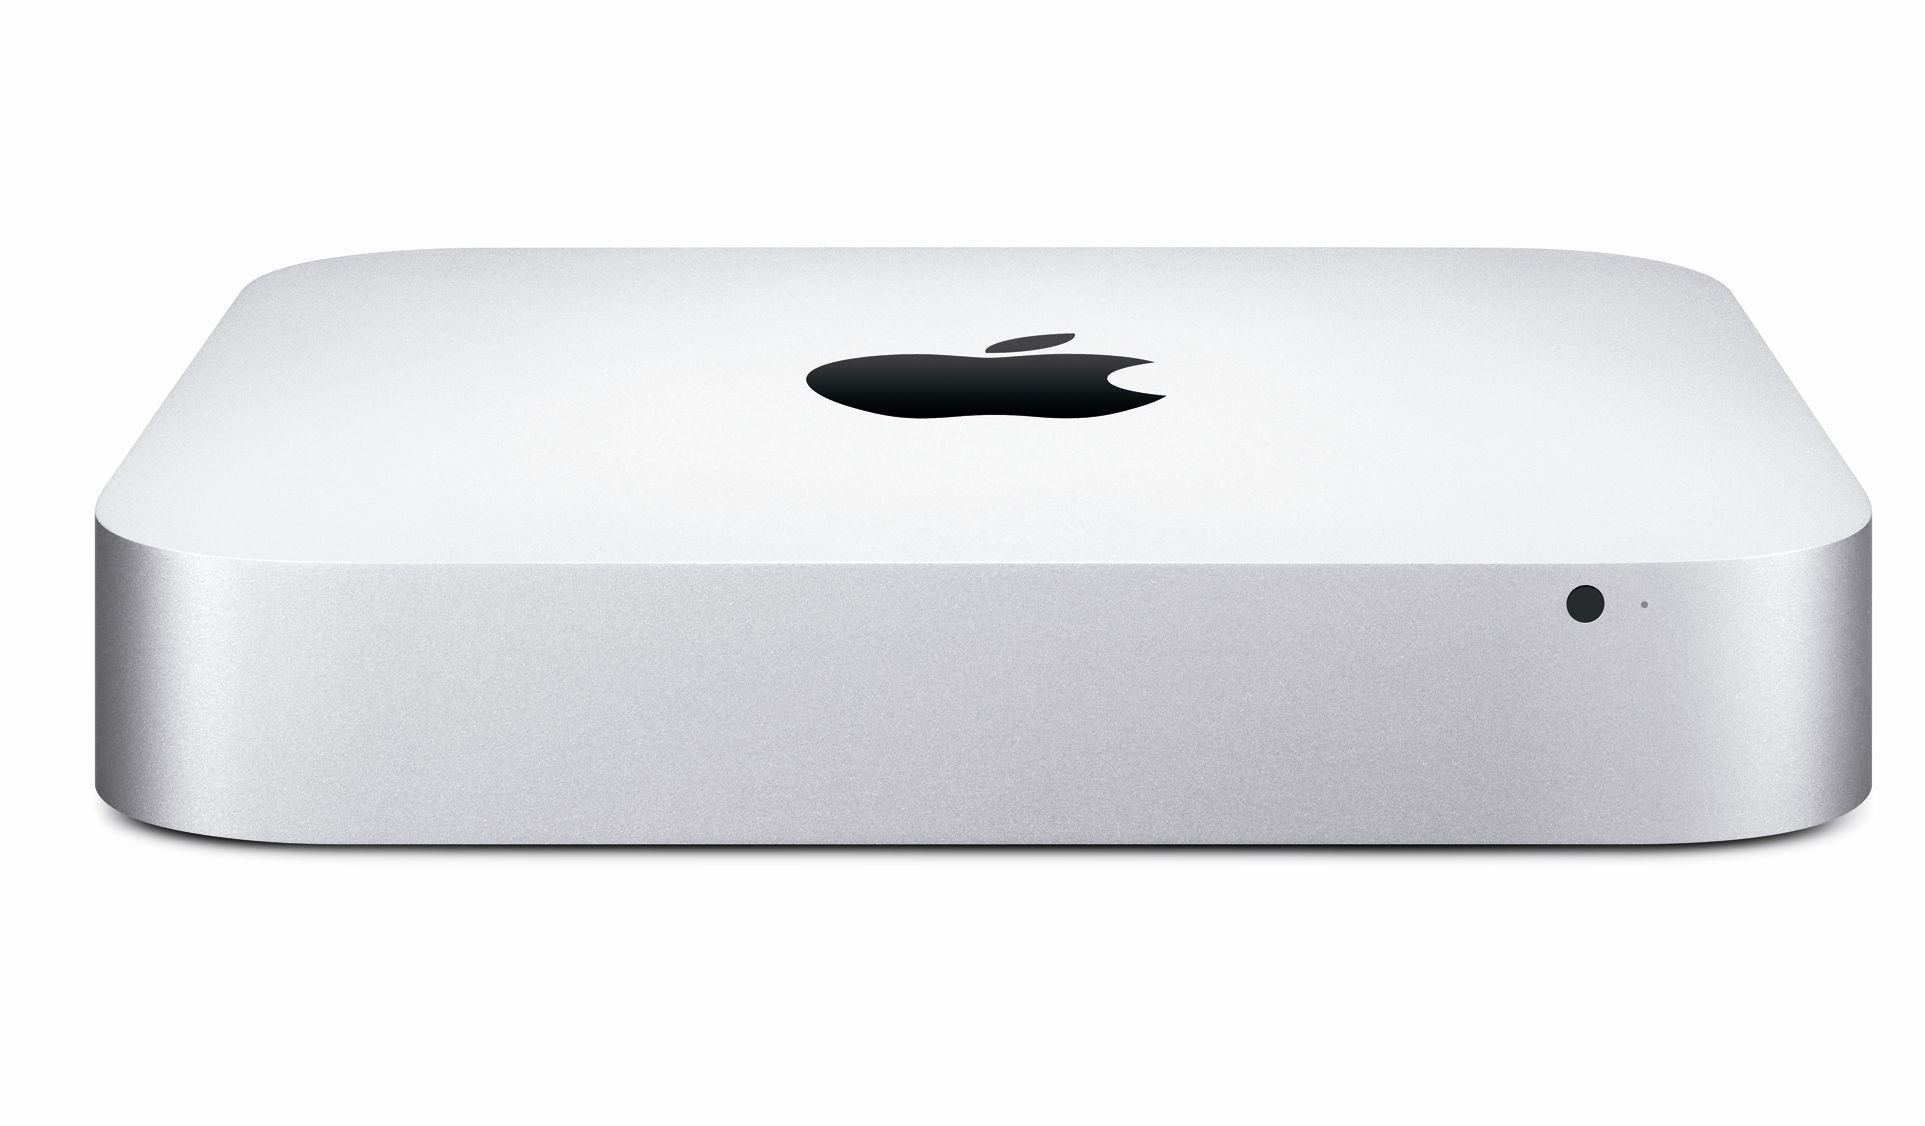 Refurbished Apple A Grade Desktop Computer Mac mini Aluminum Unibody 2.3GHZ Quad Core i7 (Late 2012) MD388LL/A 4 GB DDR3 1 TB HDD Intel HD Graphics 4000 Sierra 10.12 0